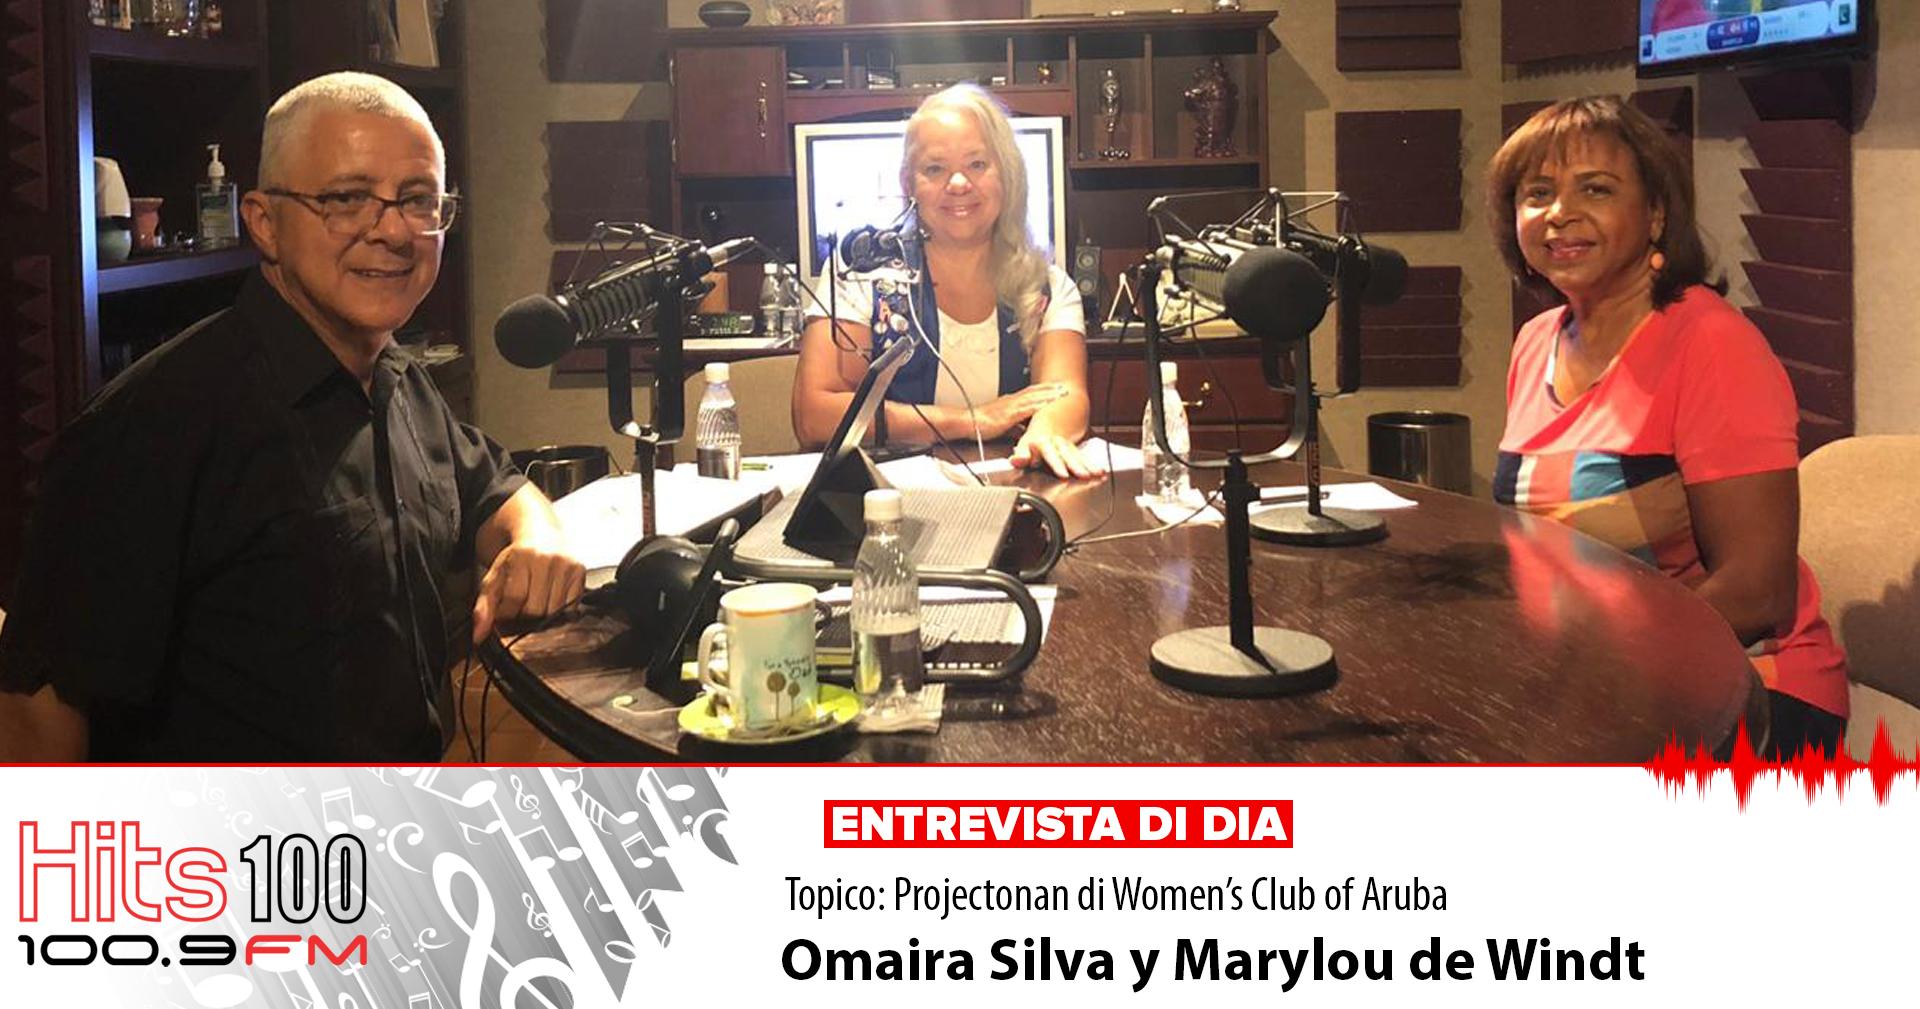 Hits100-entresivta-260619.jpg